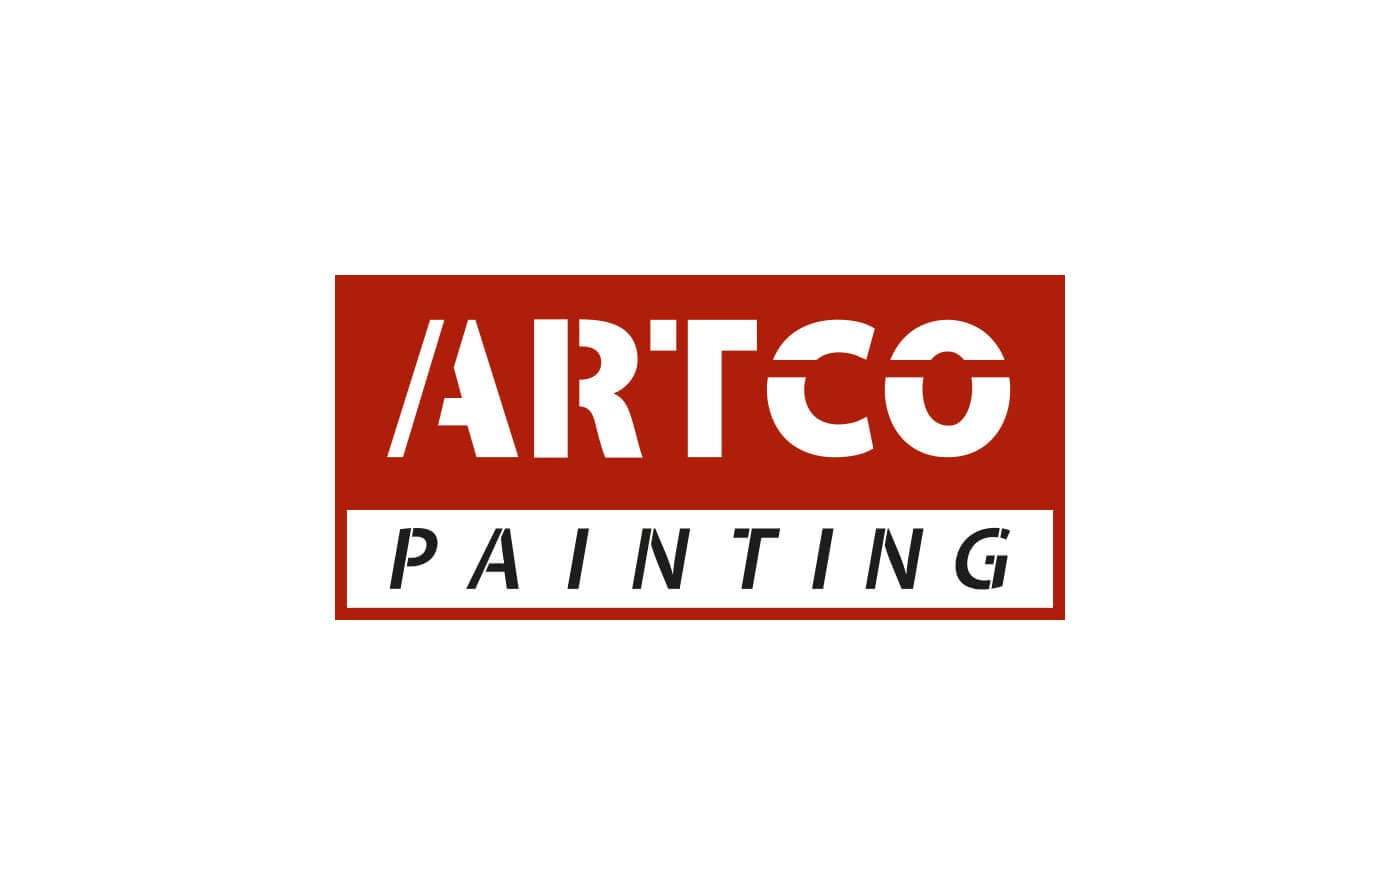 2017 ARTCO Painting logo